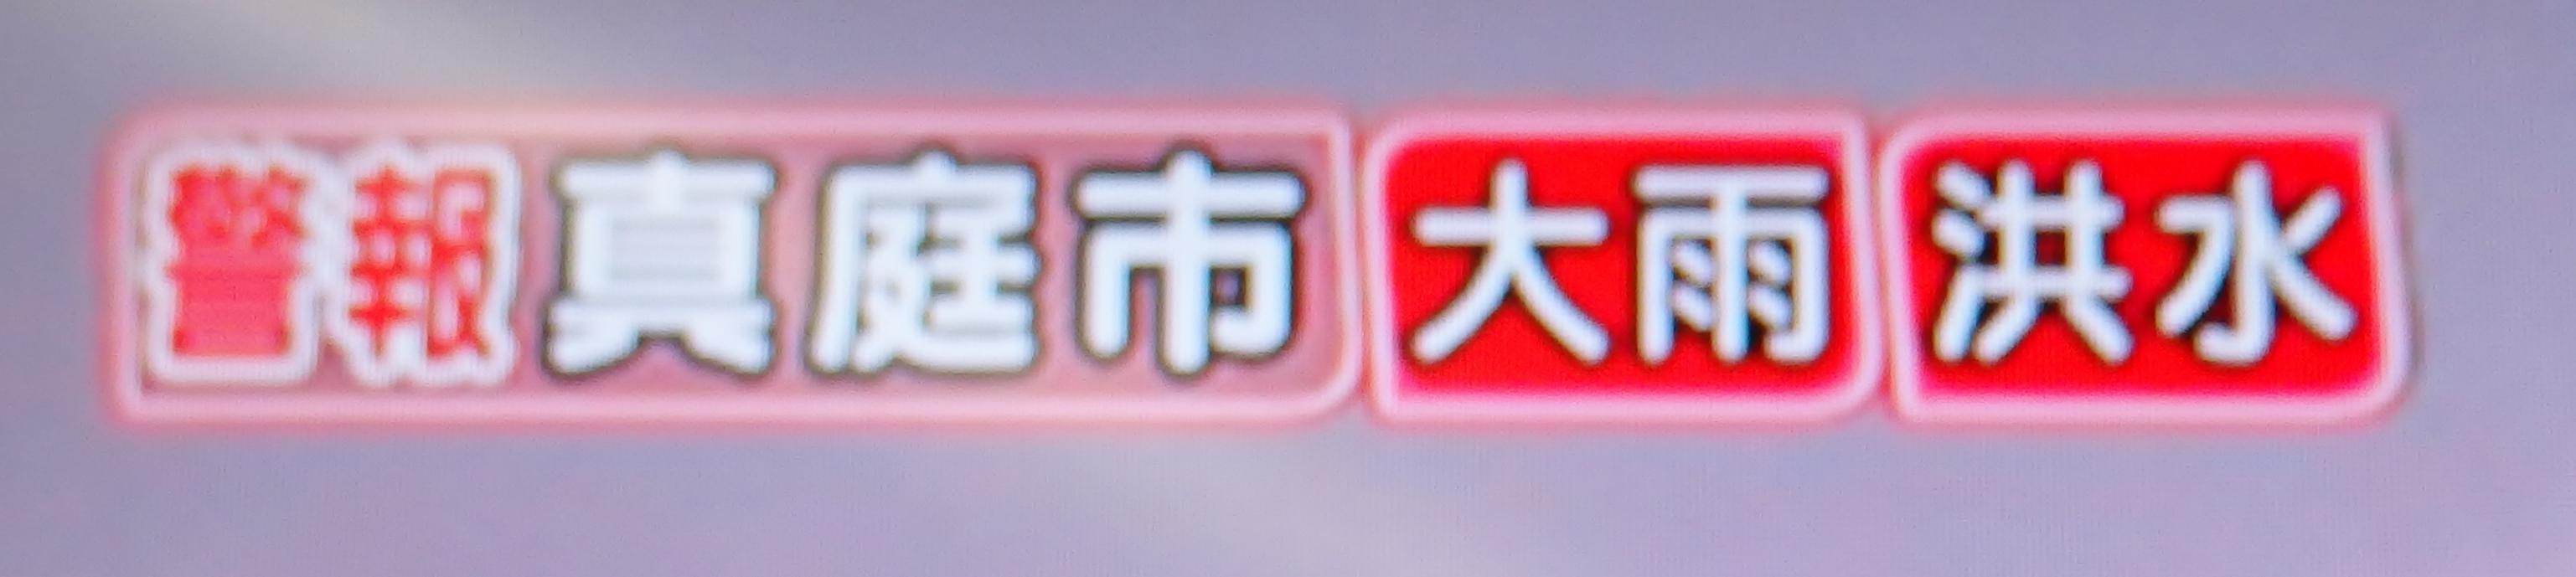 P9040344.jpg